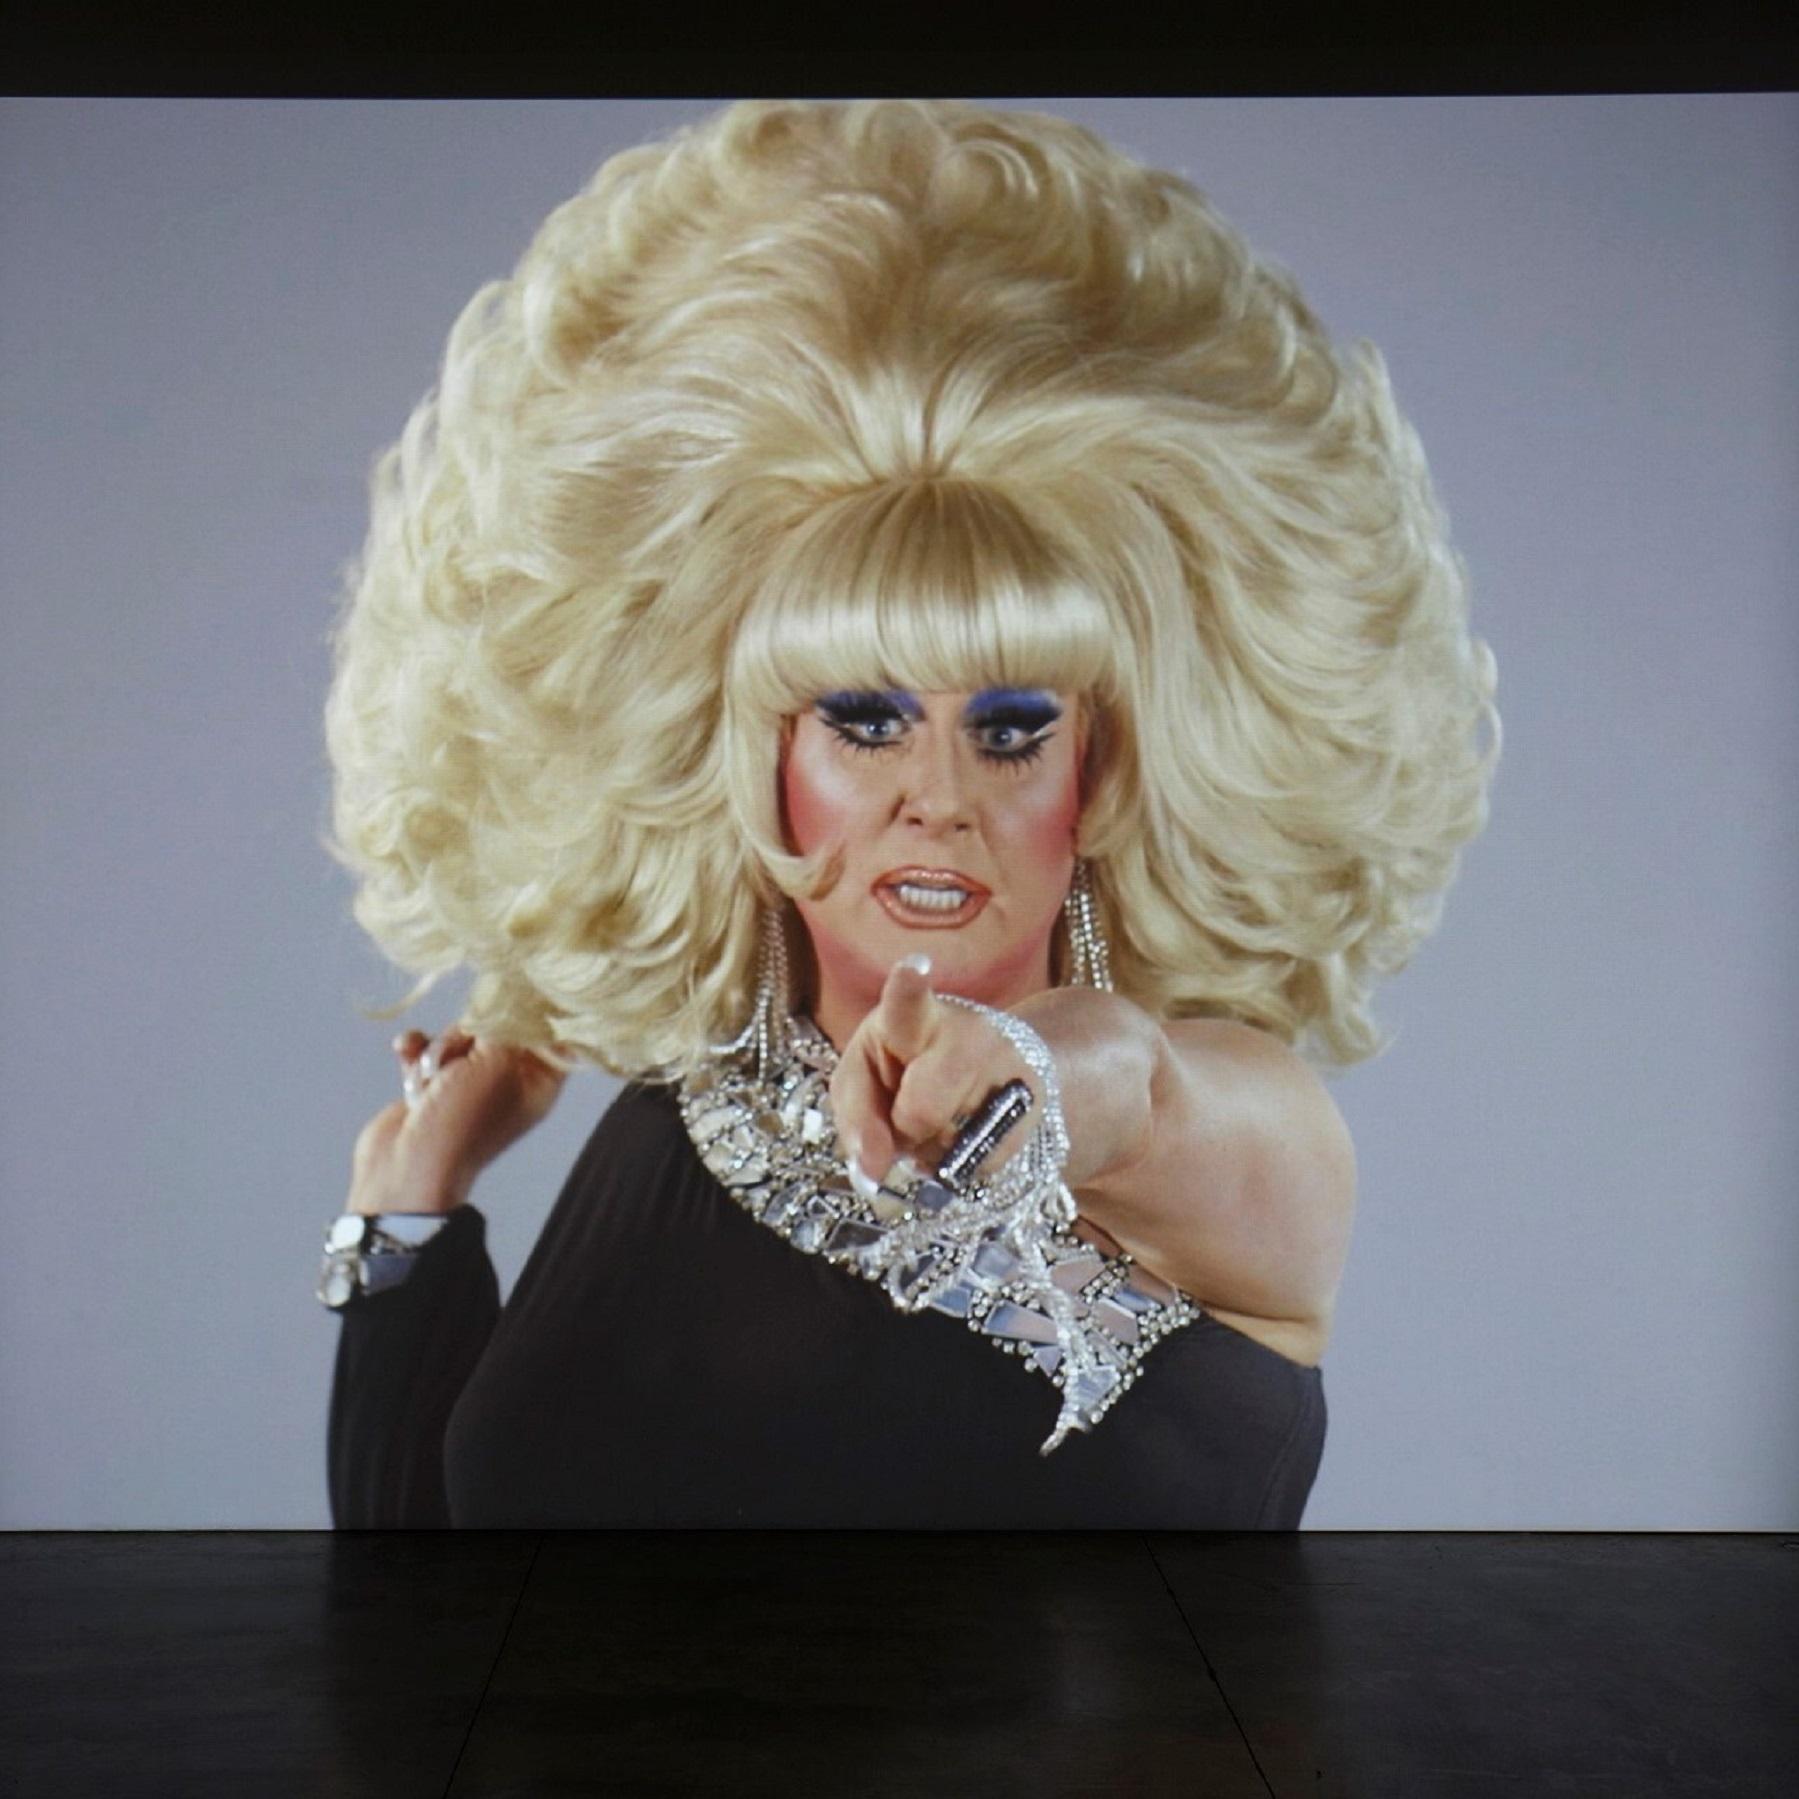 Fondazione ICA Milano | CHARLES ATLAS. Ominous, Glamorous, Momentous, Ridiculous